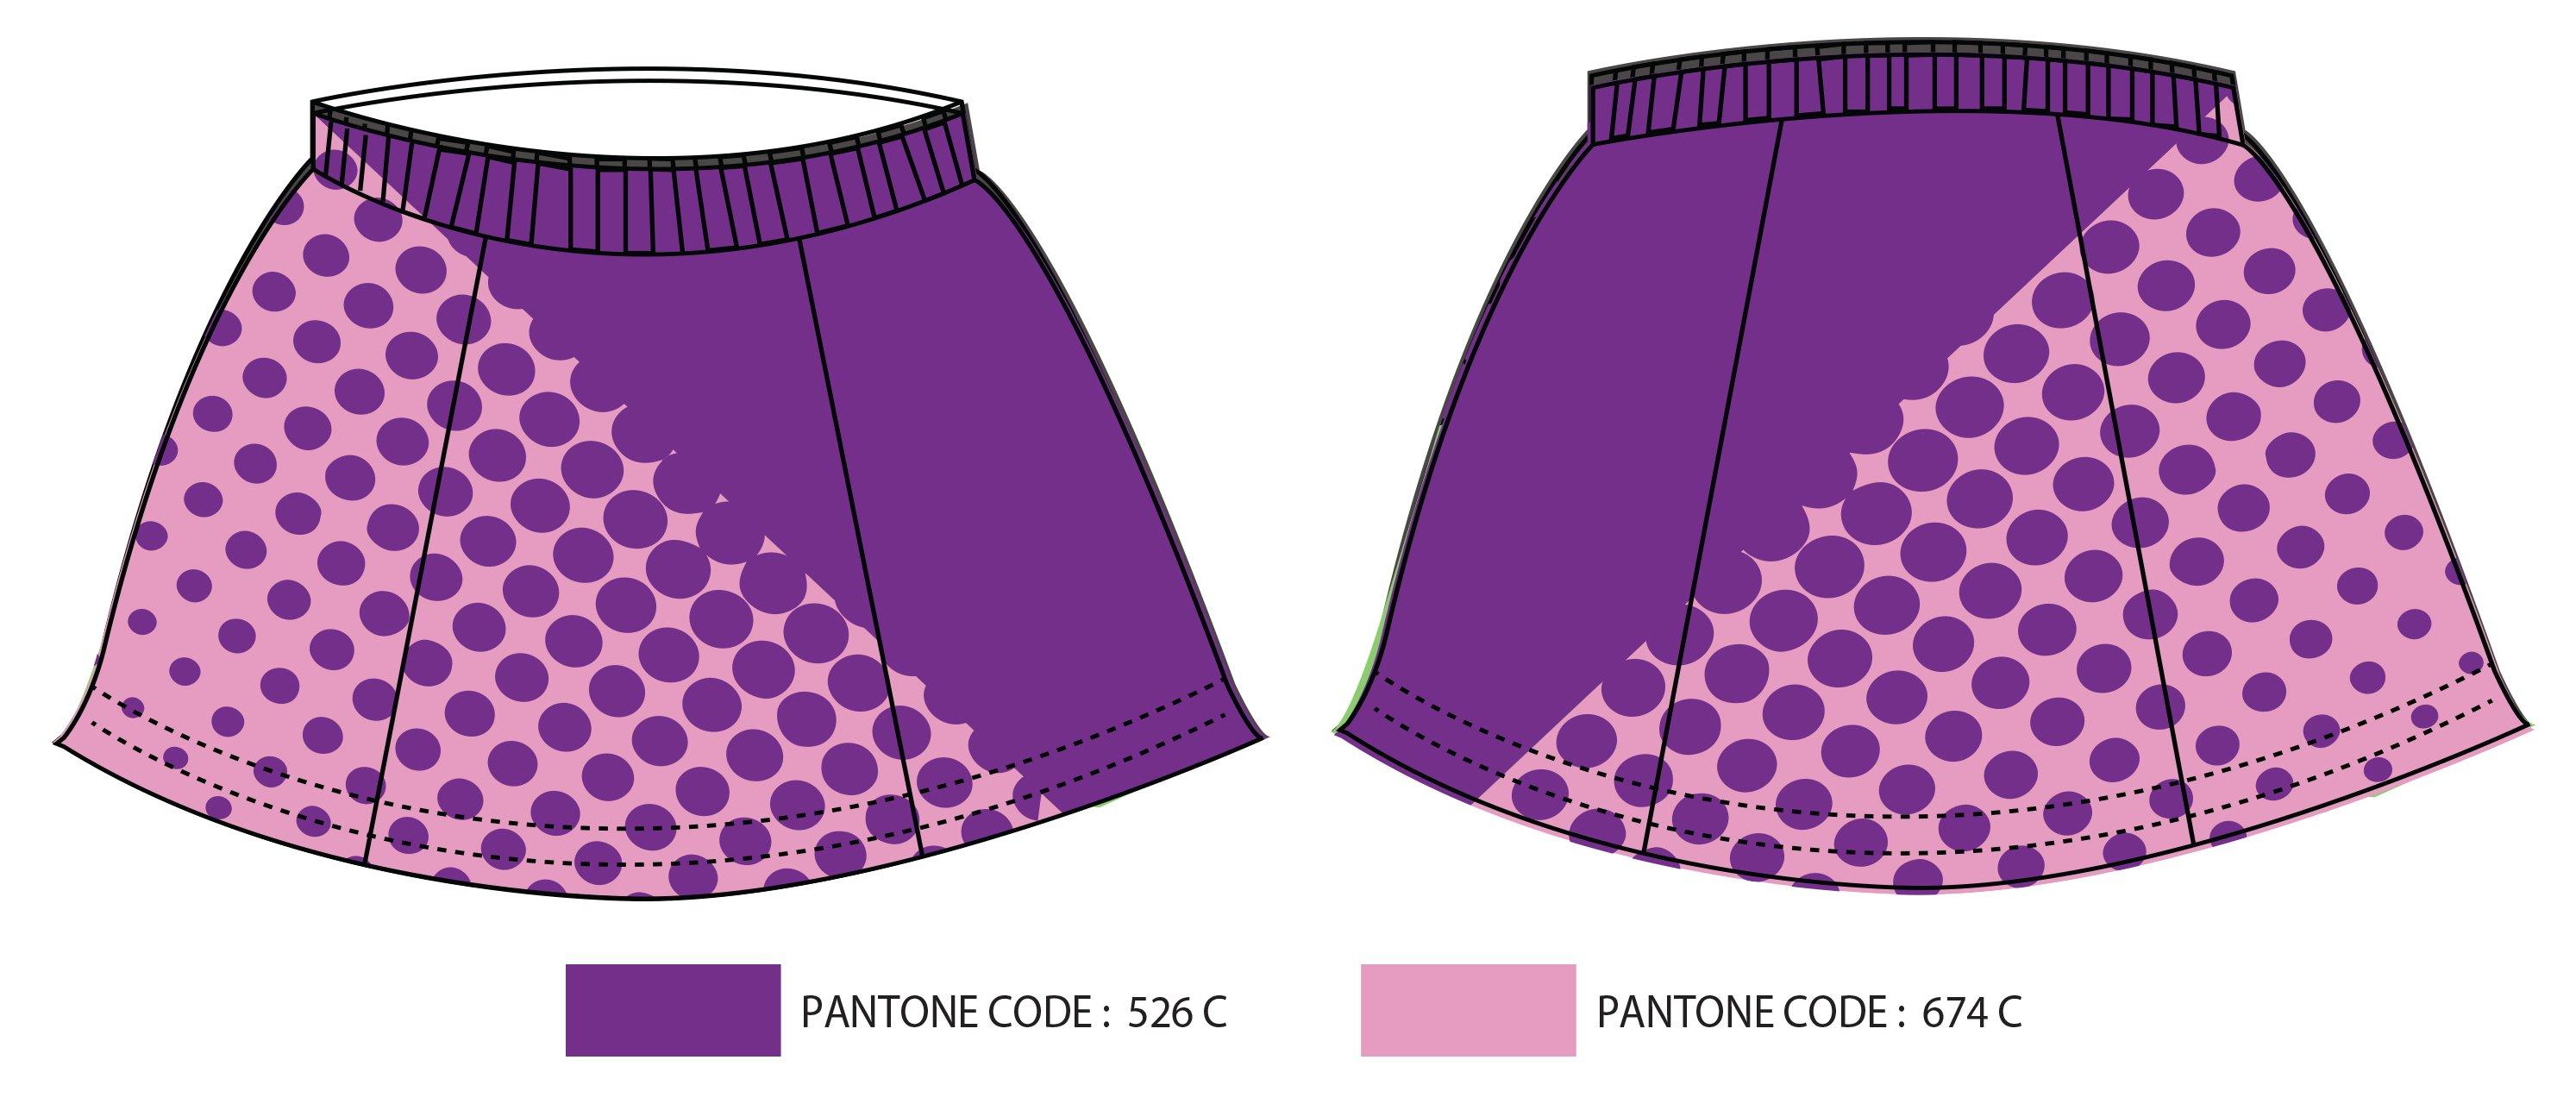 Netball Skirt 012 – brizsports com au